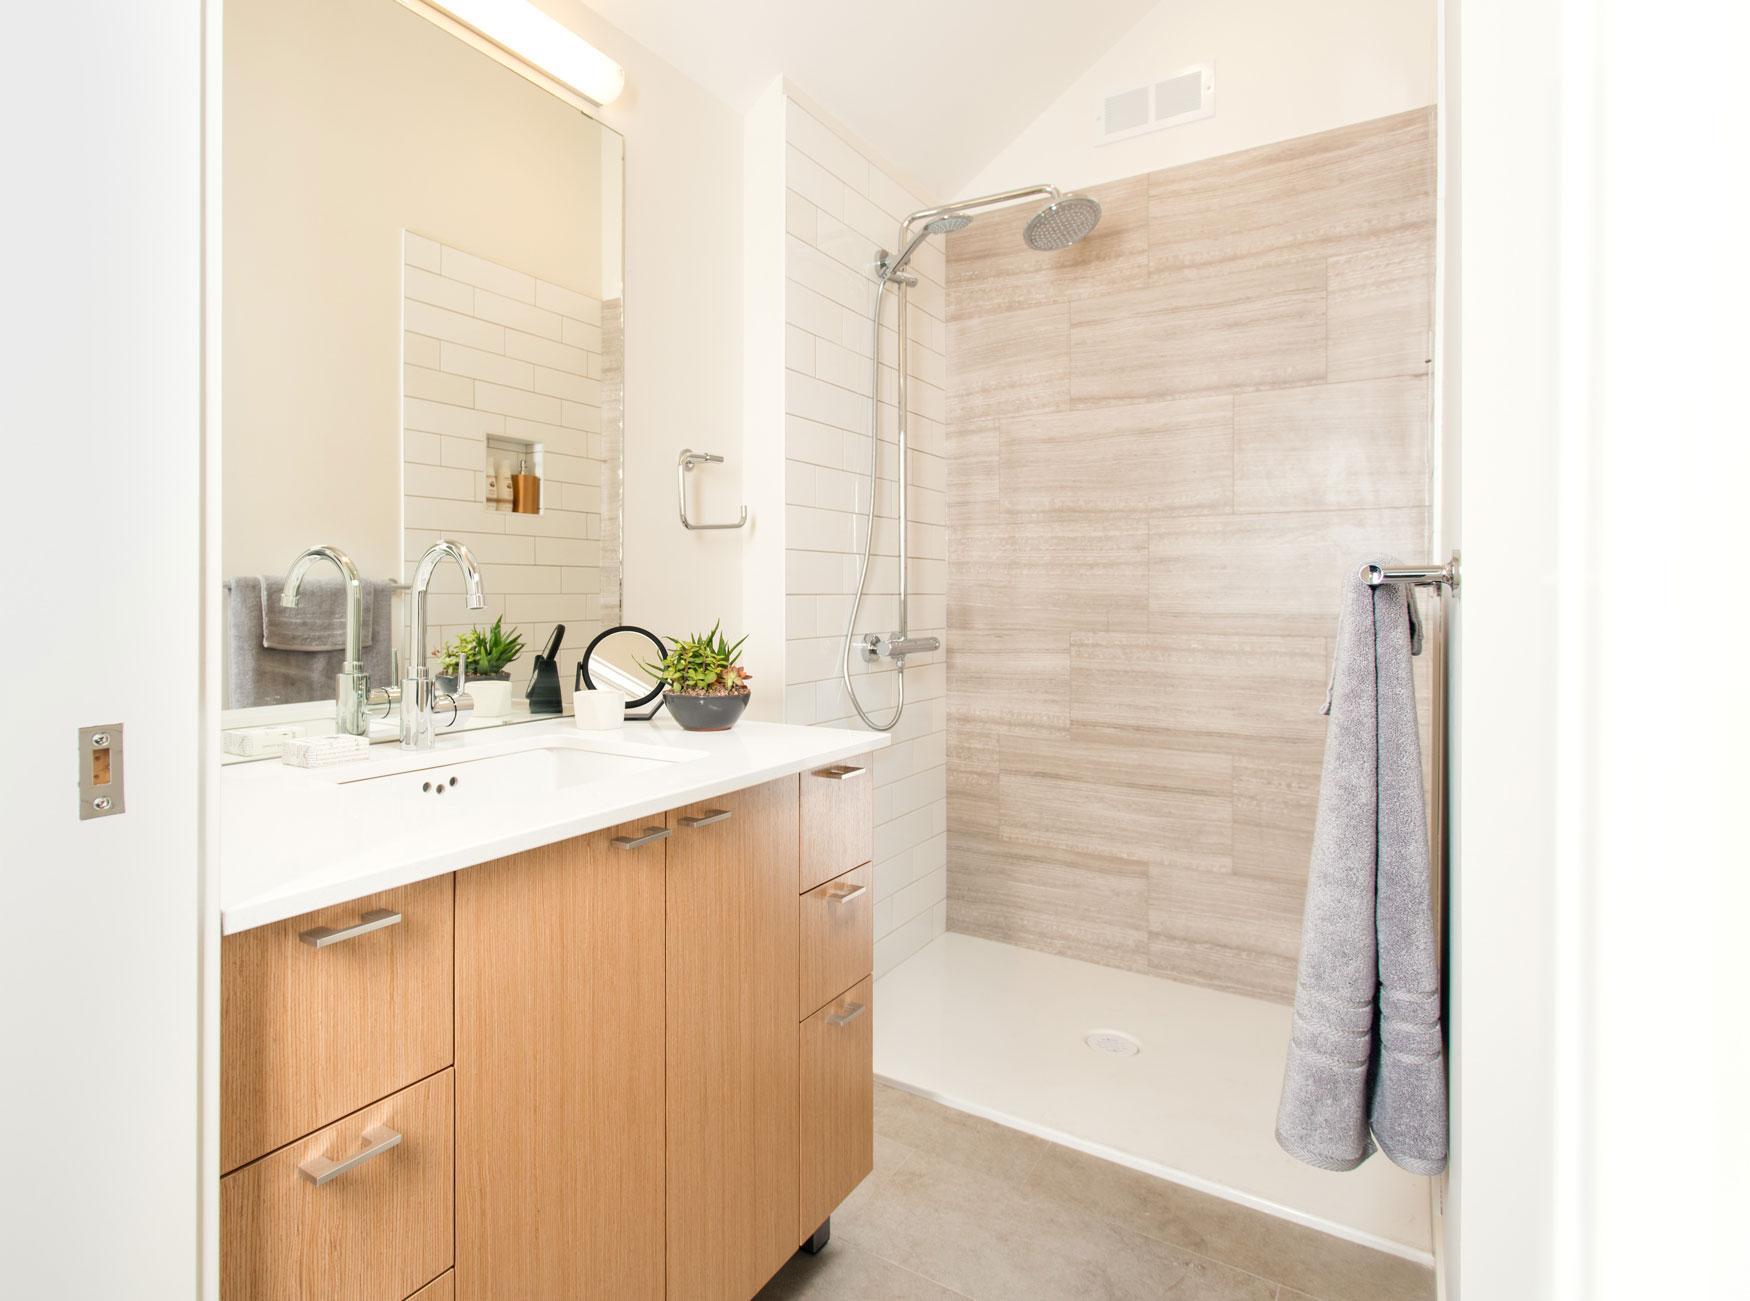 13-Bathroom.jpg